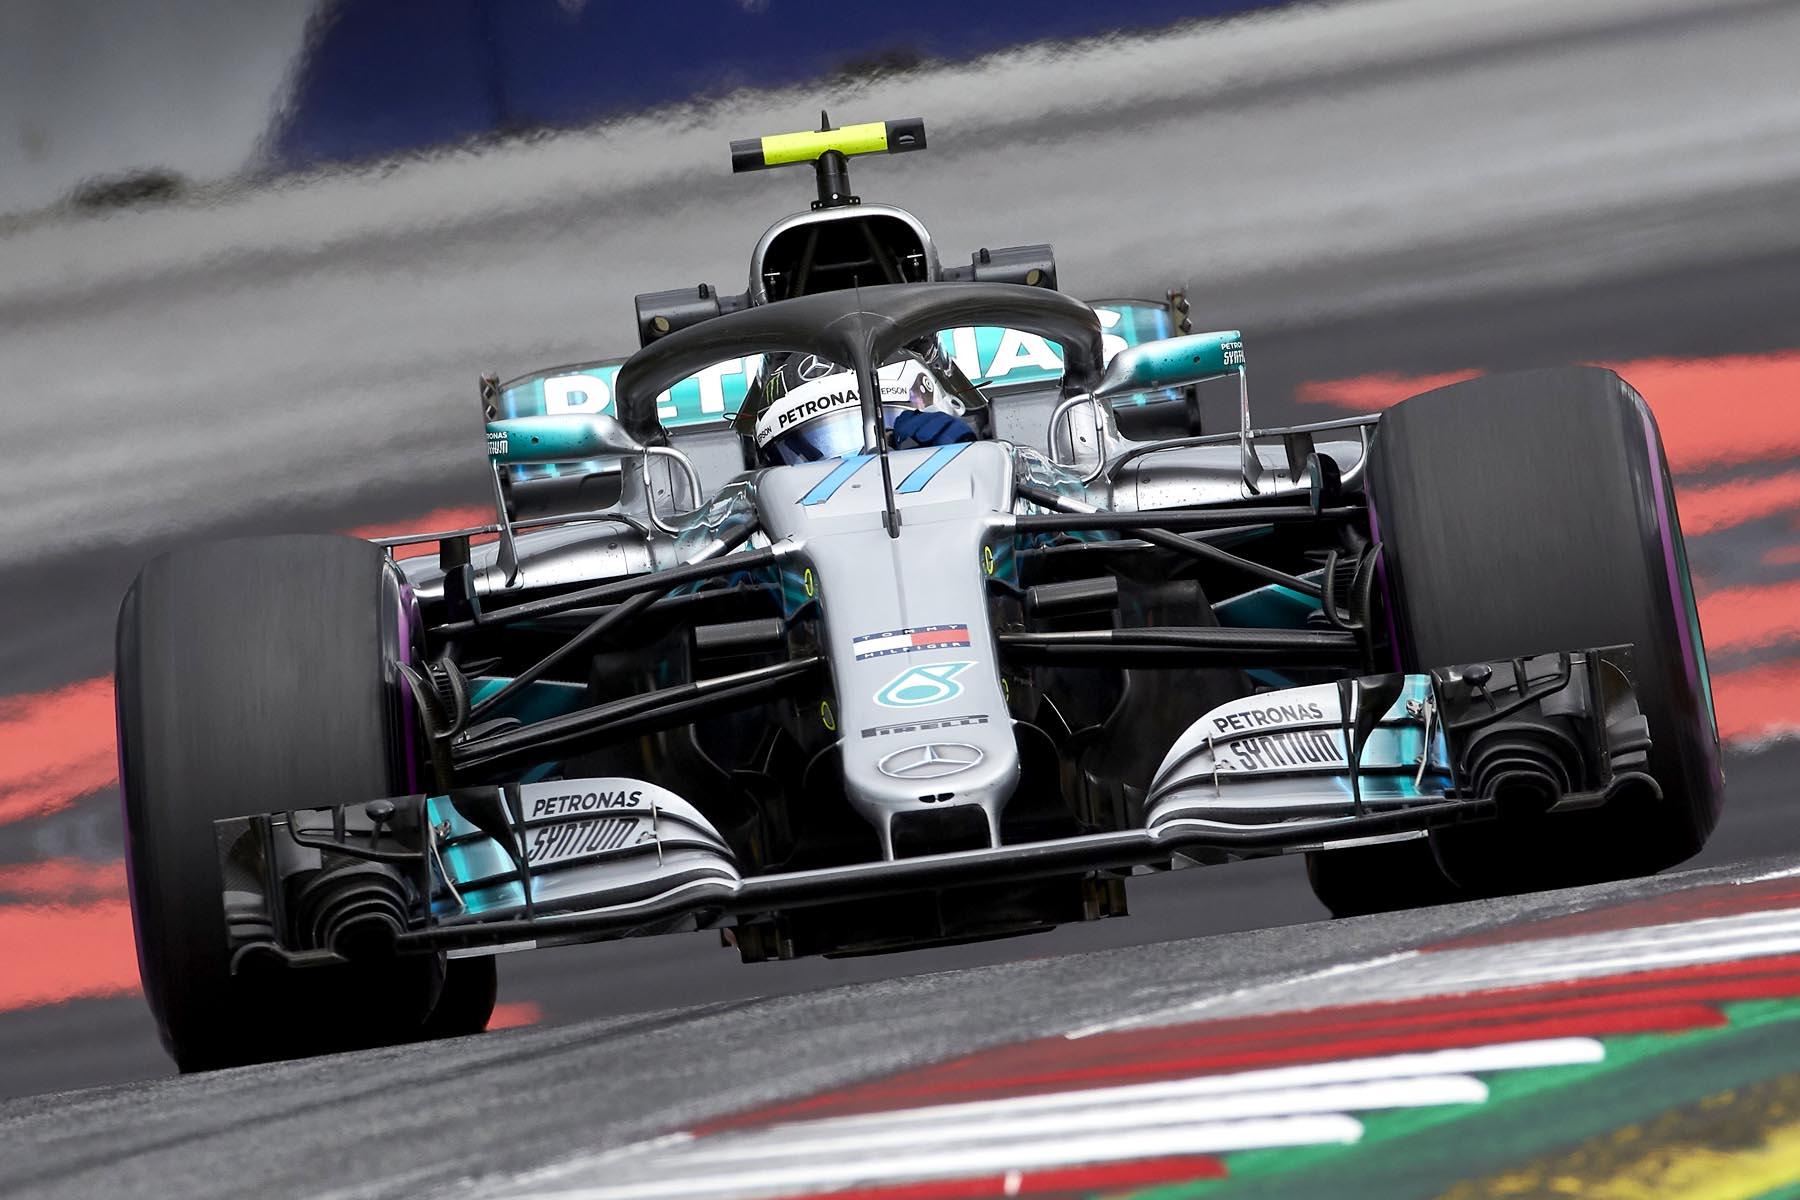 Valtteri Bottas on track at the 2018 Austrian Grand Prix.